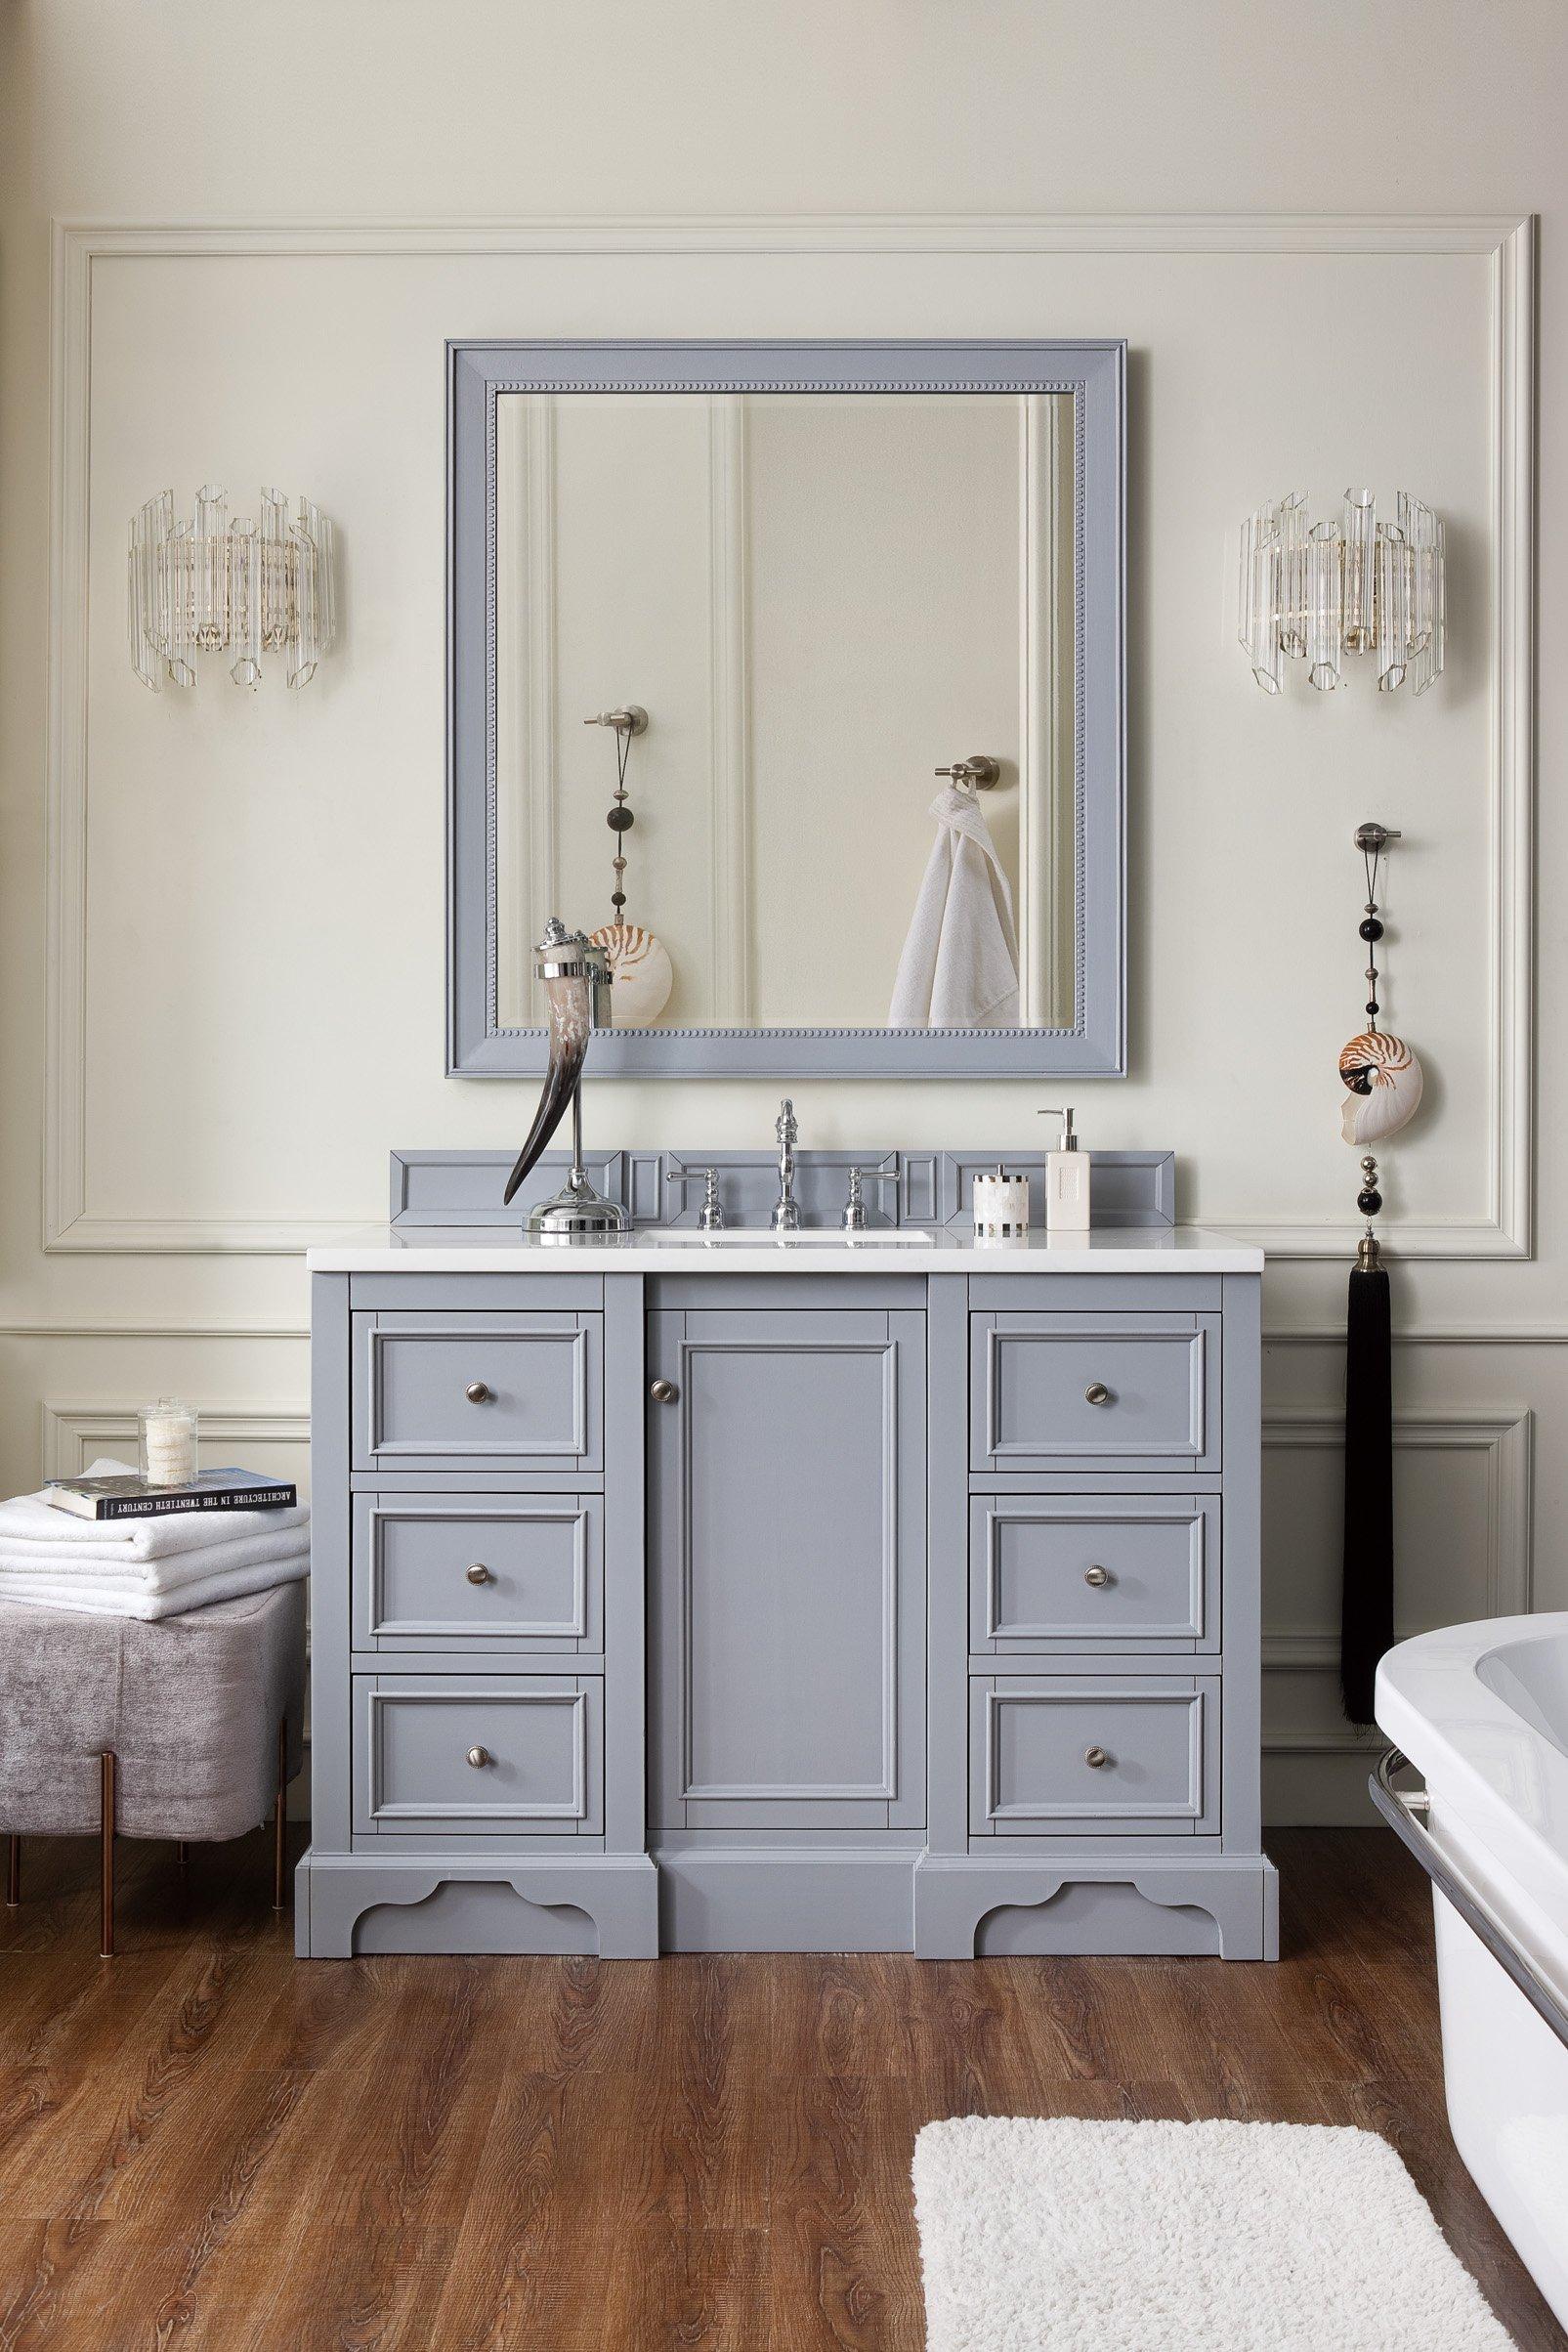 De Soto 48 Single Bathroom Vanity Single Sink Bathroom Vanity Single Bathroom Vanity Bathroom Sink Vanity